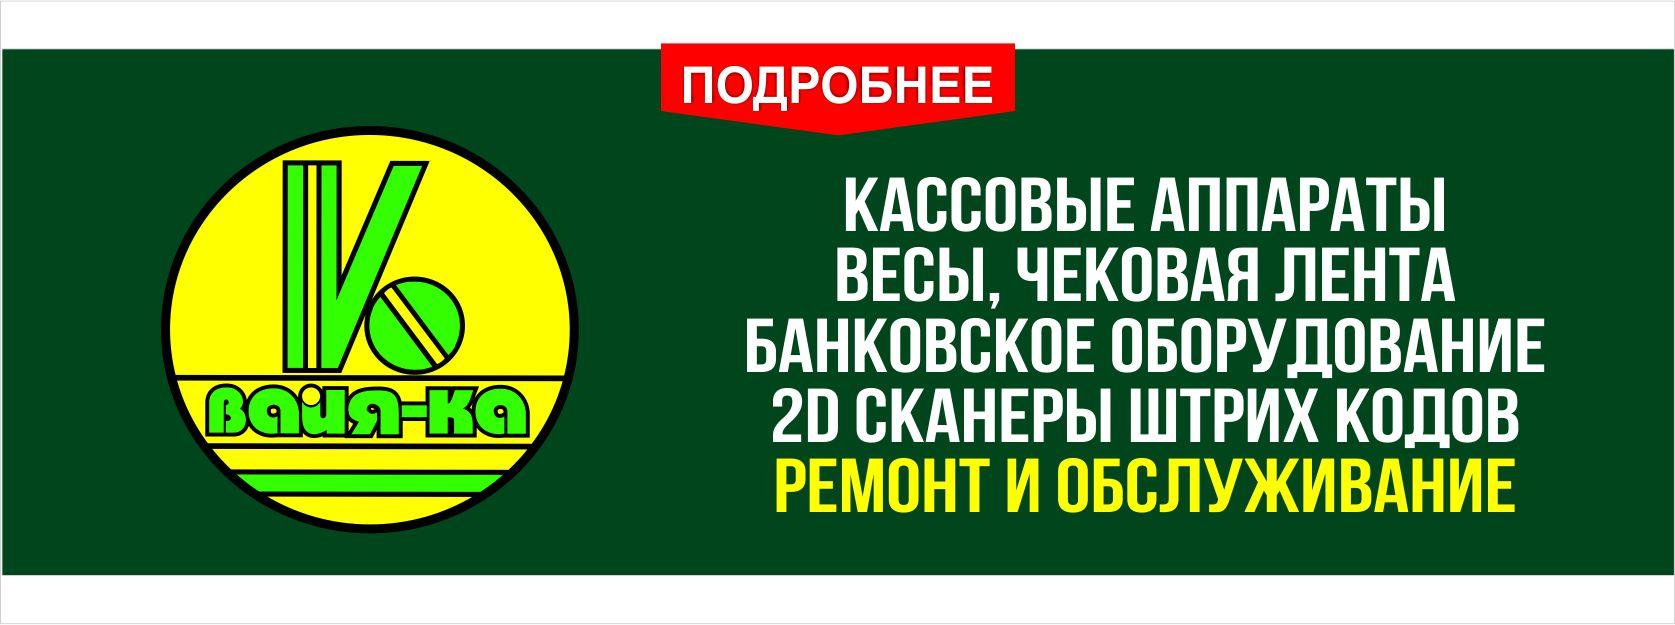 http://www.vaia.kz/blog/news/vizitka